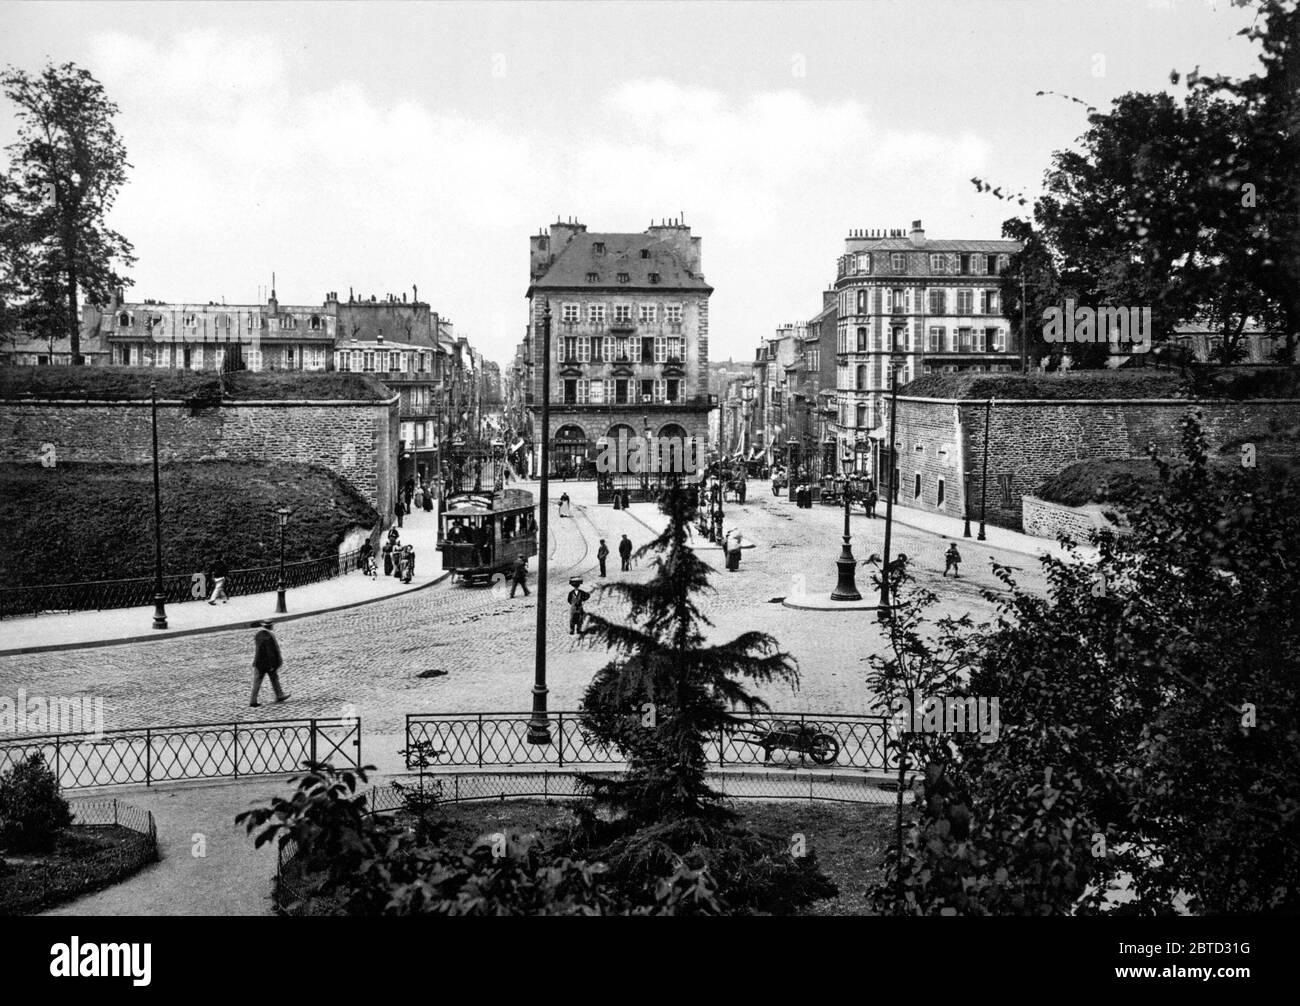 https www alamy com place des portes brest france ca 1890 1900 image359246876 html